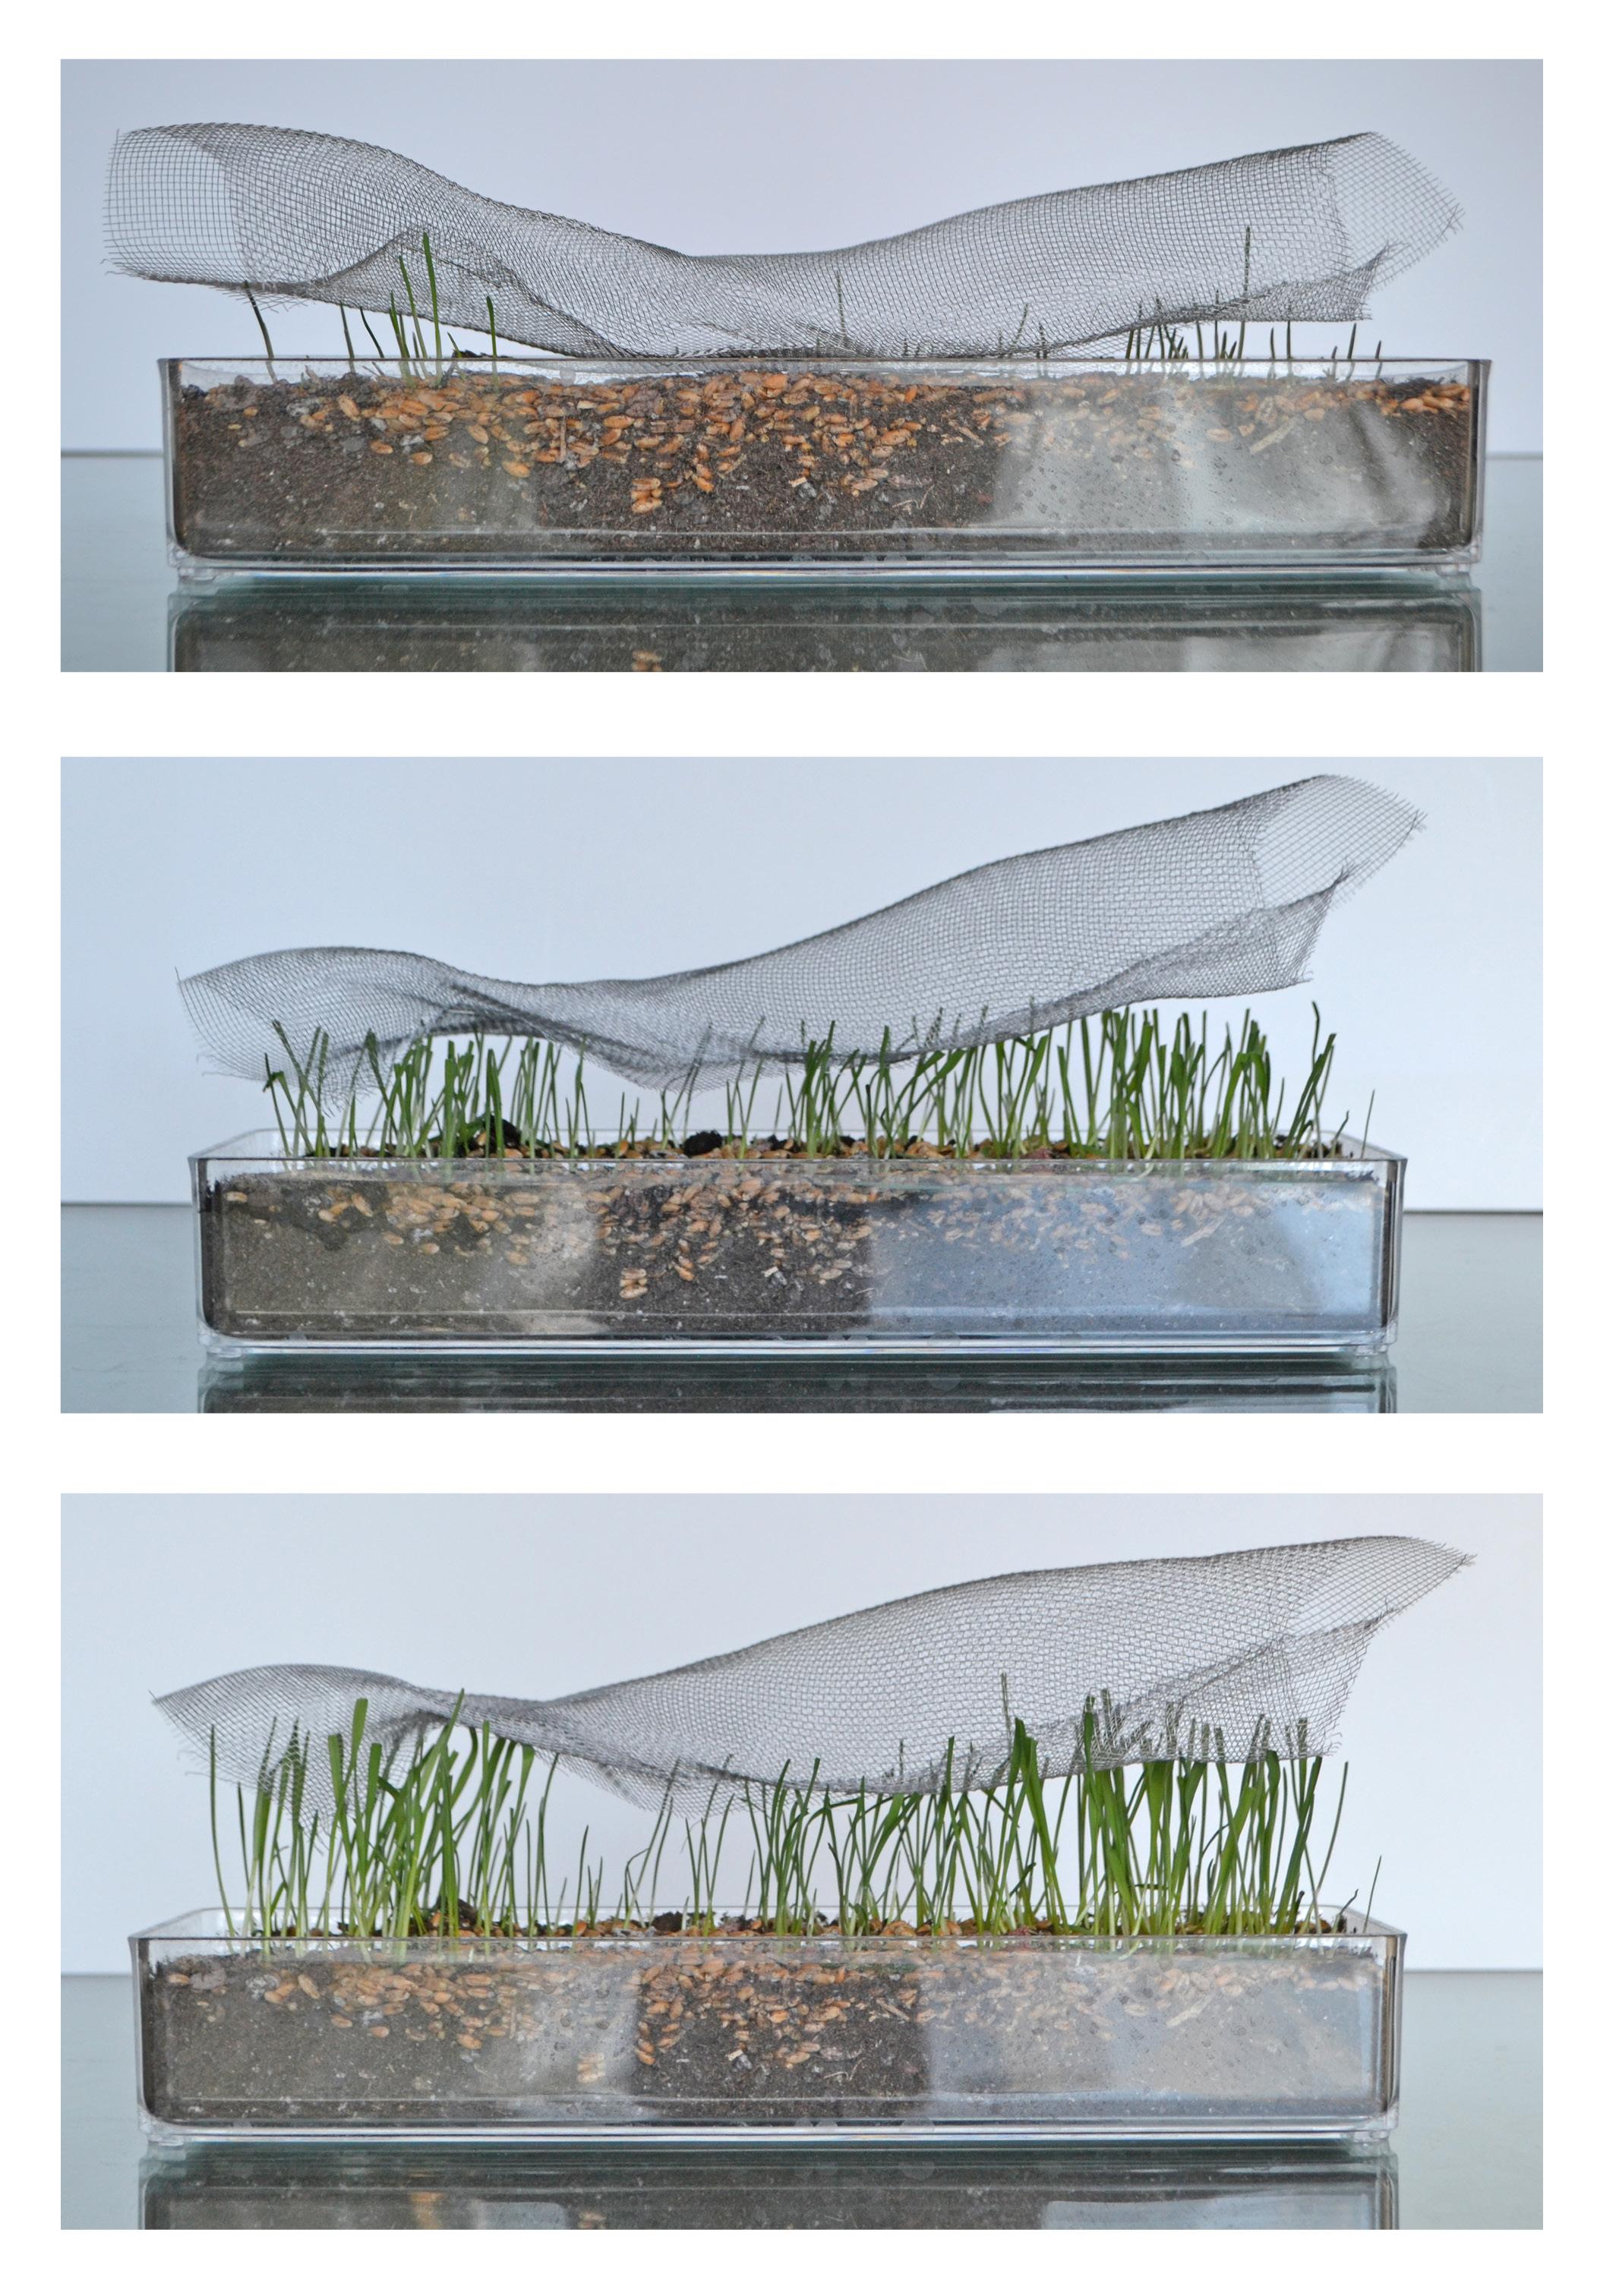 SparanoMooneyArchitecture_Chandler Residence_Concept Model6.jpg